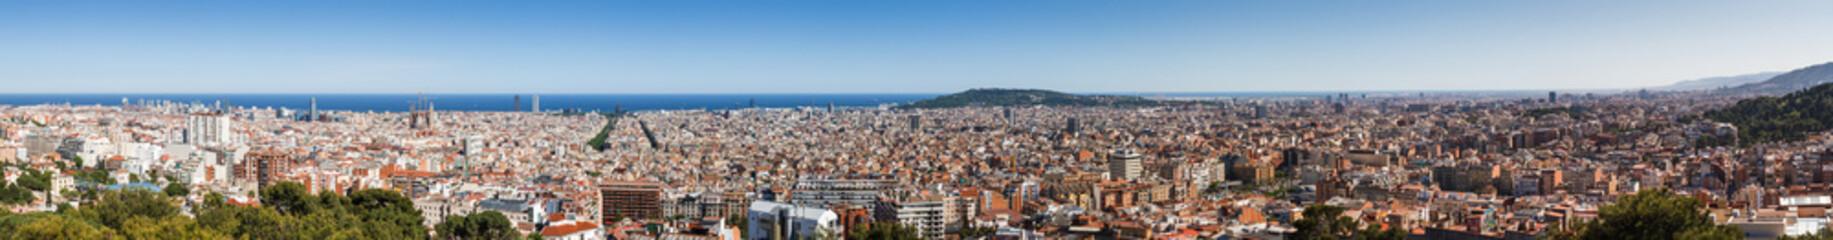 Entire Barcelona Panorama